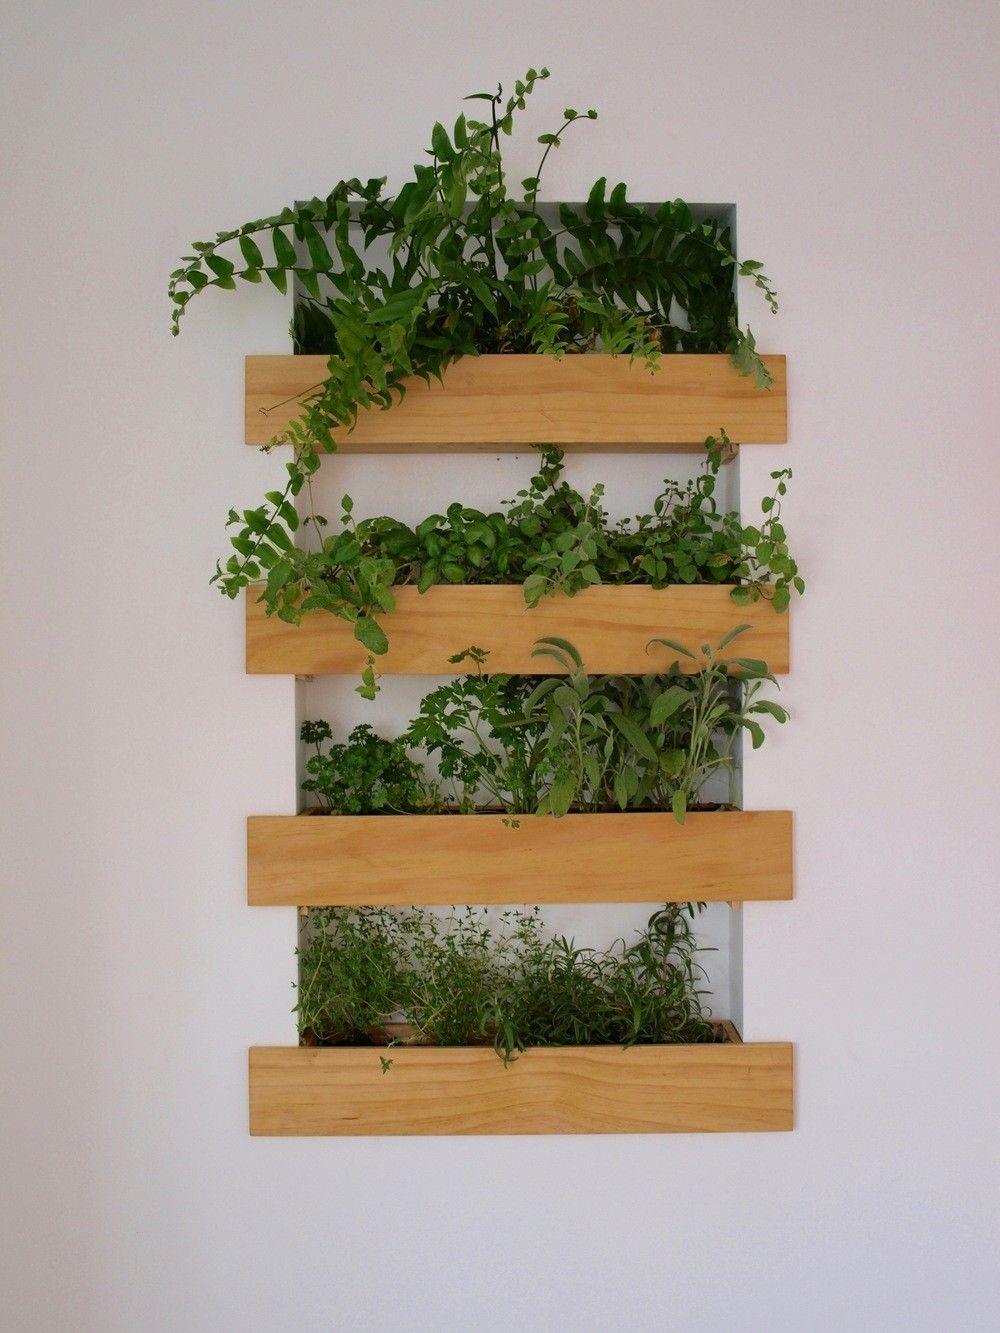 Interior Planter Box Built In Herb Garden Wall Planters Indoor Diy Wall Planter Planter Boxes